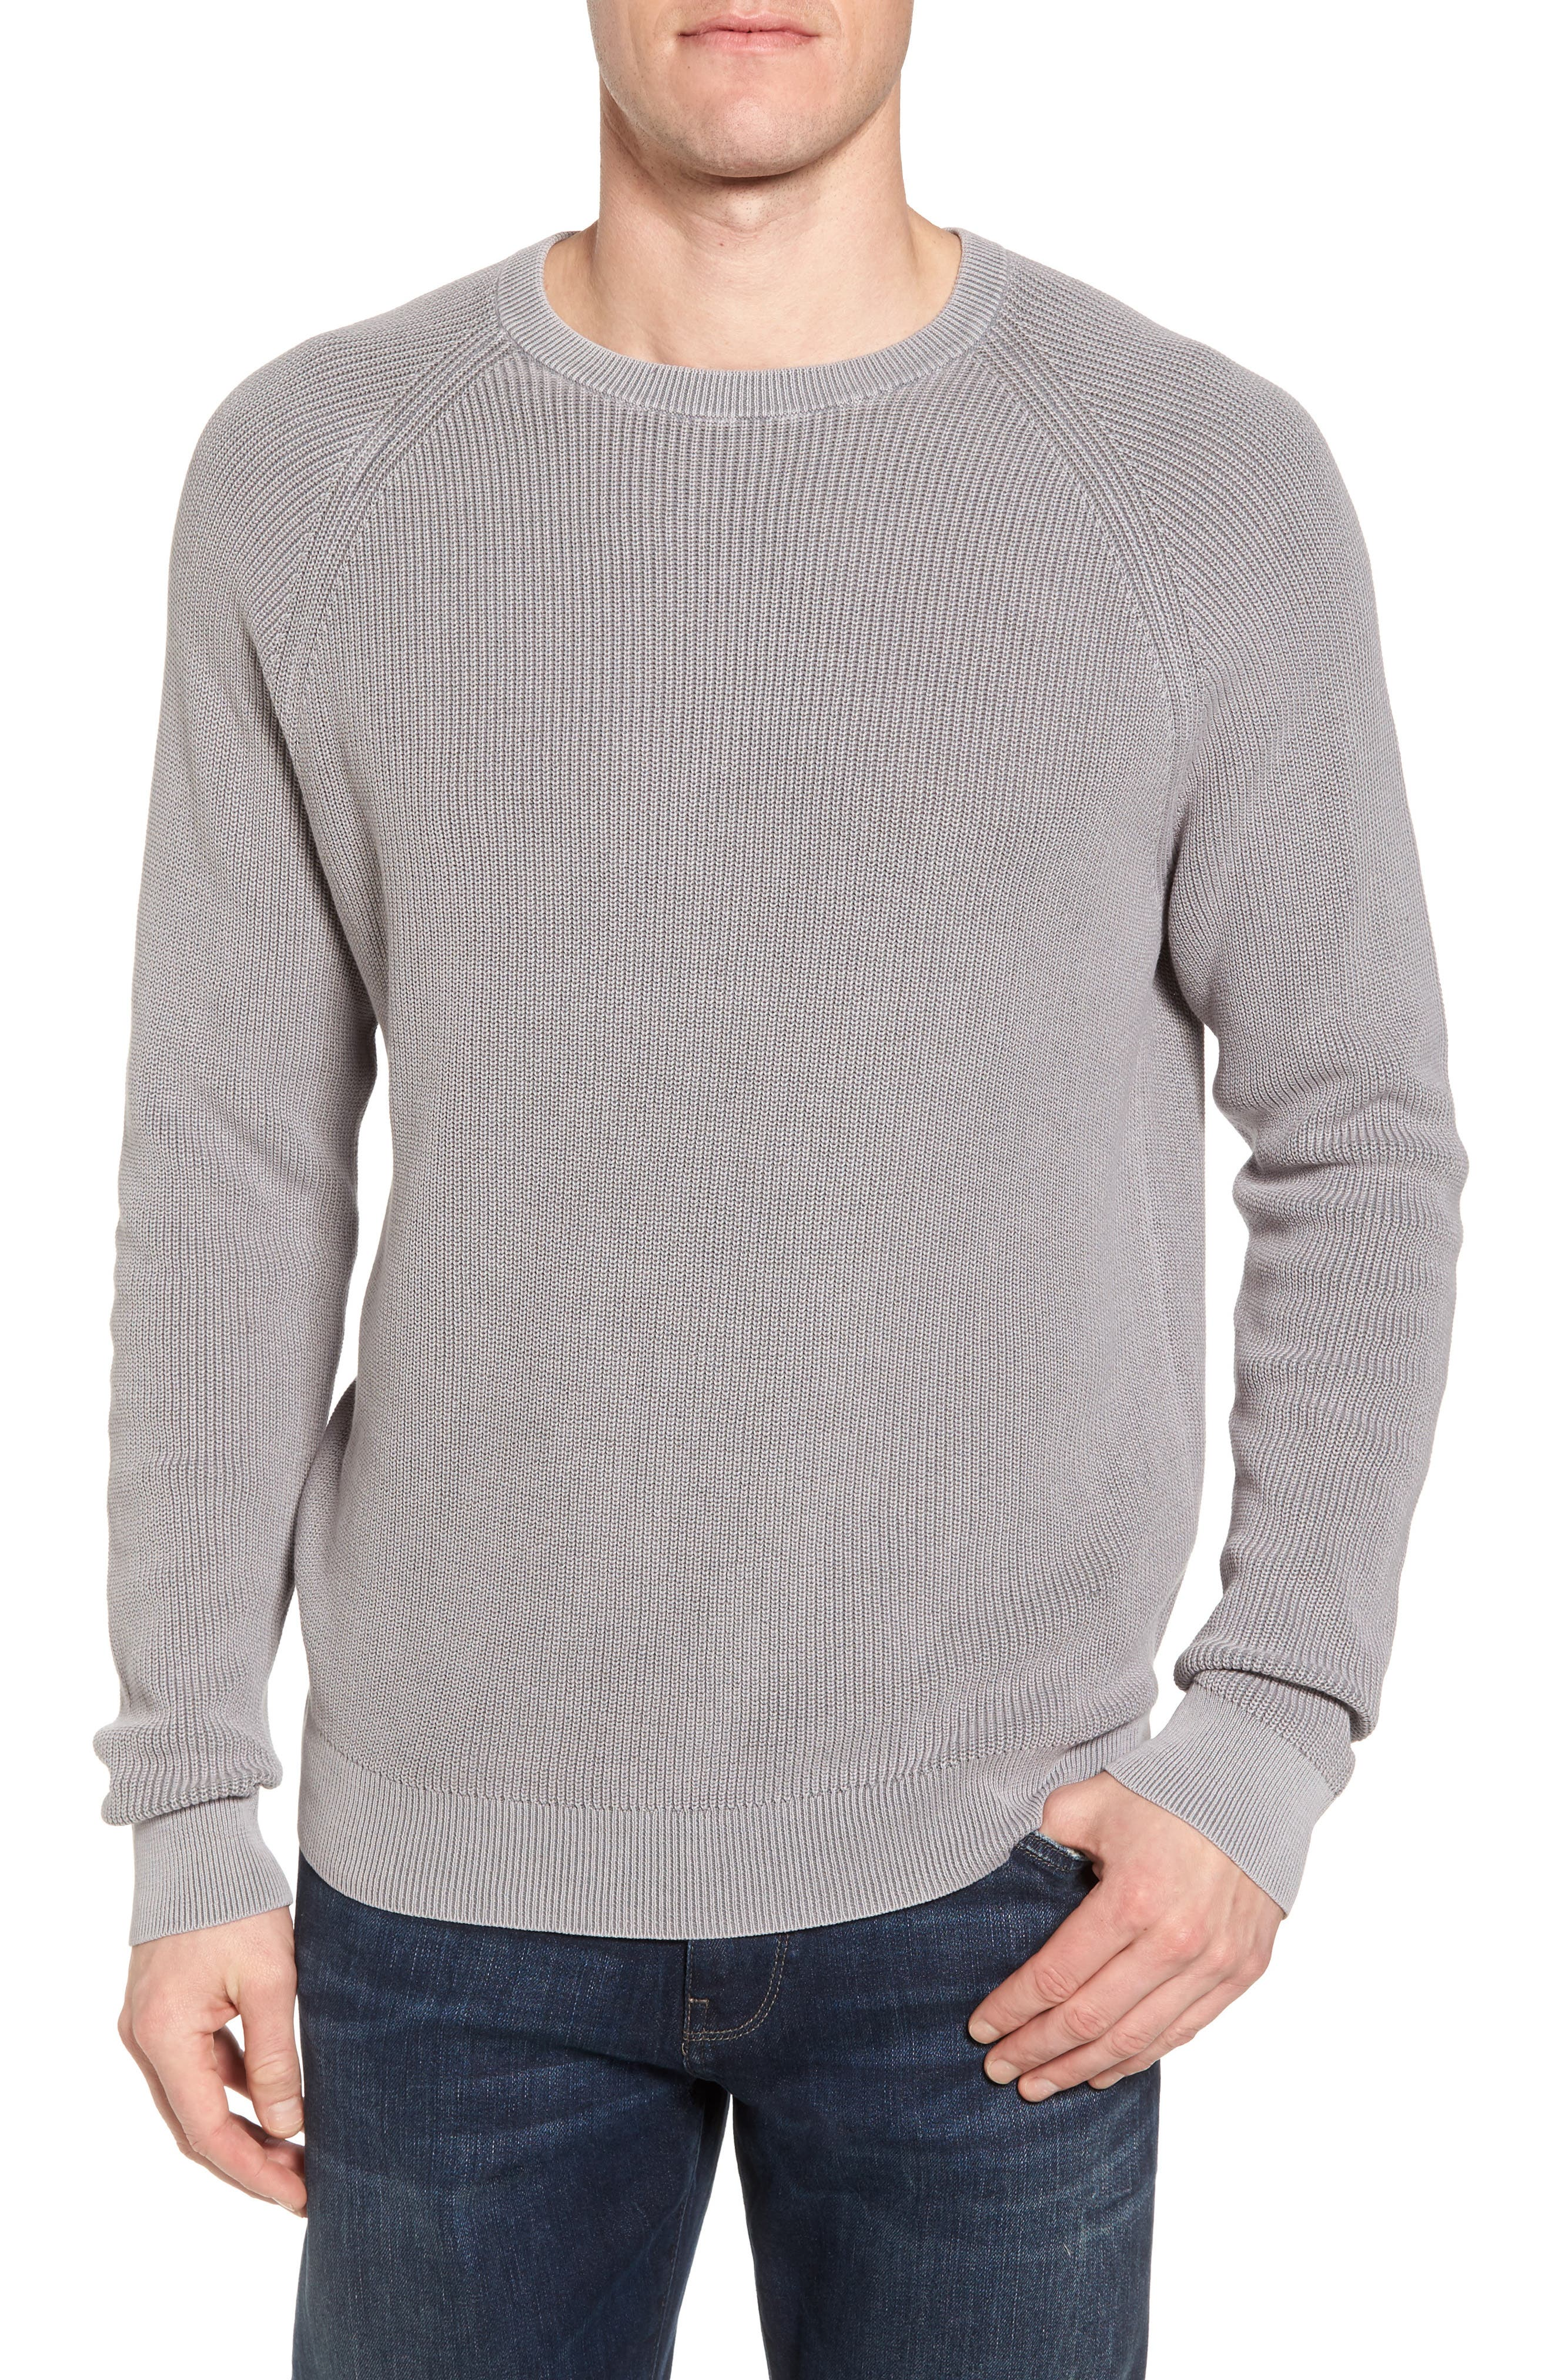 Crewneck Sweater,                         Main,                         color, Grey Weather